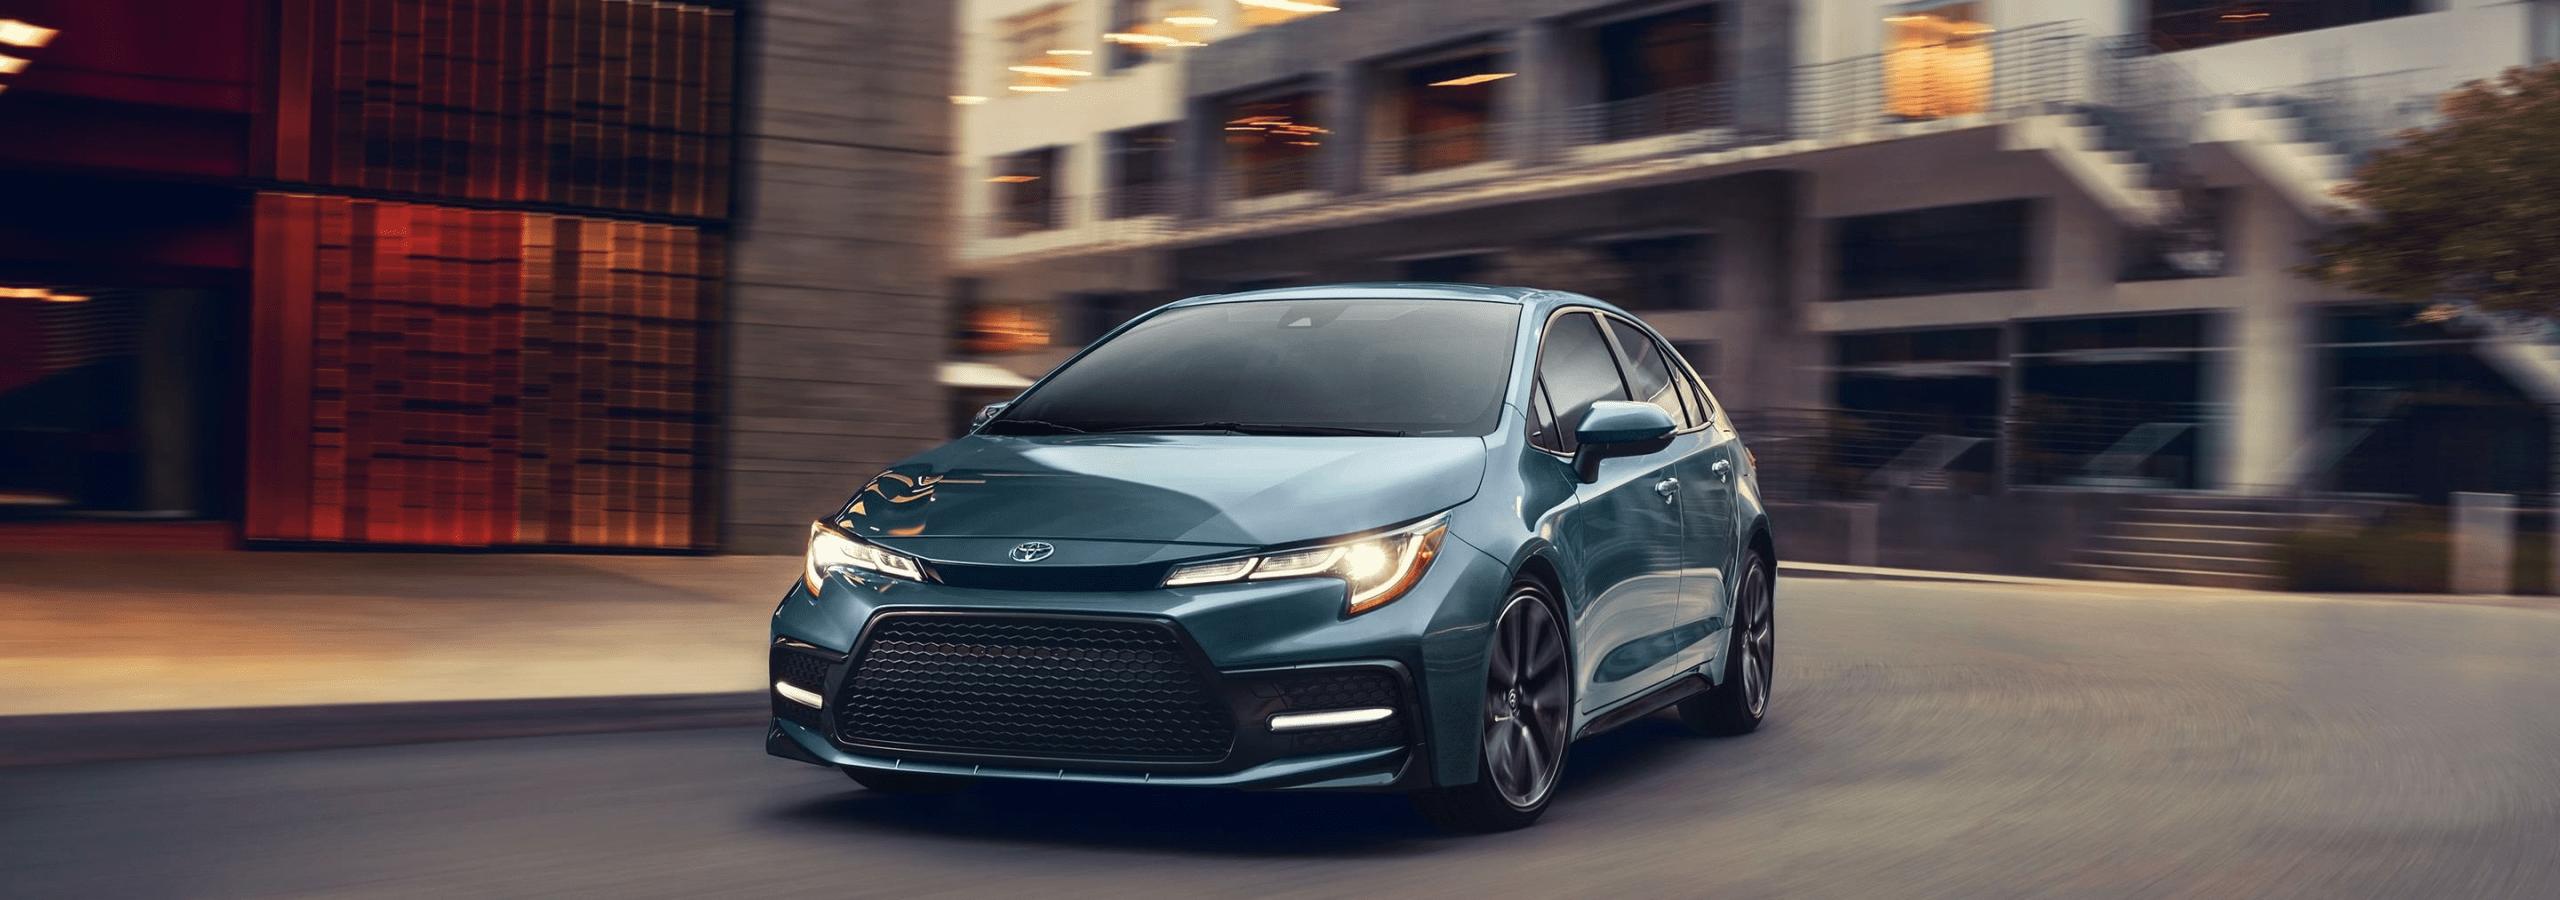 2020 Subaru Impreza Price And Release Date In 2020 Subaru Impreza Impreza Subaru